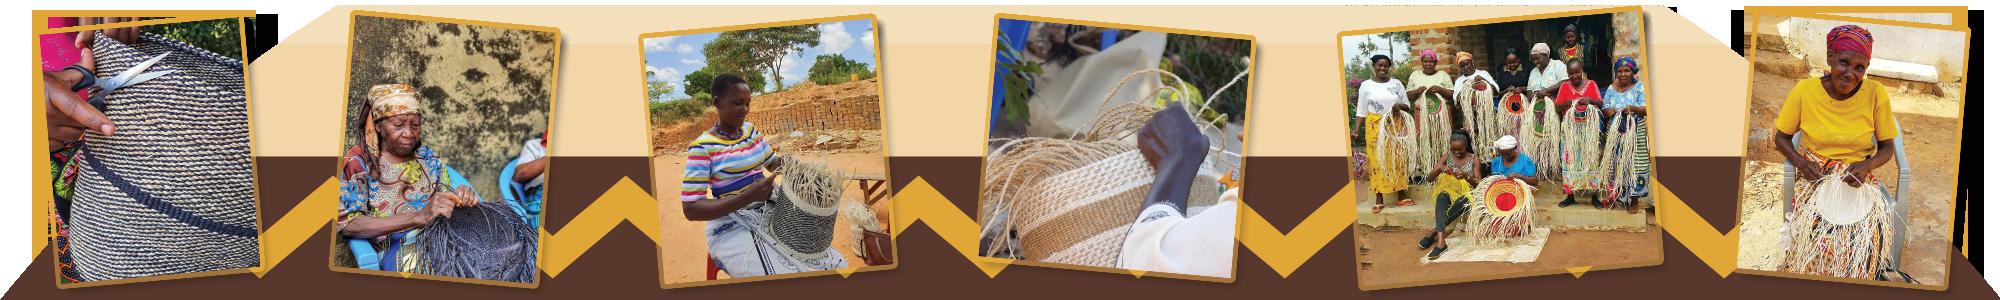 The Kenyan Craft Company - Across The World